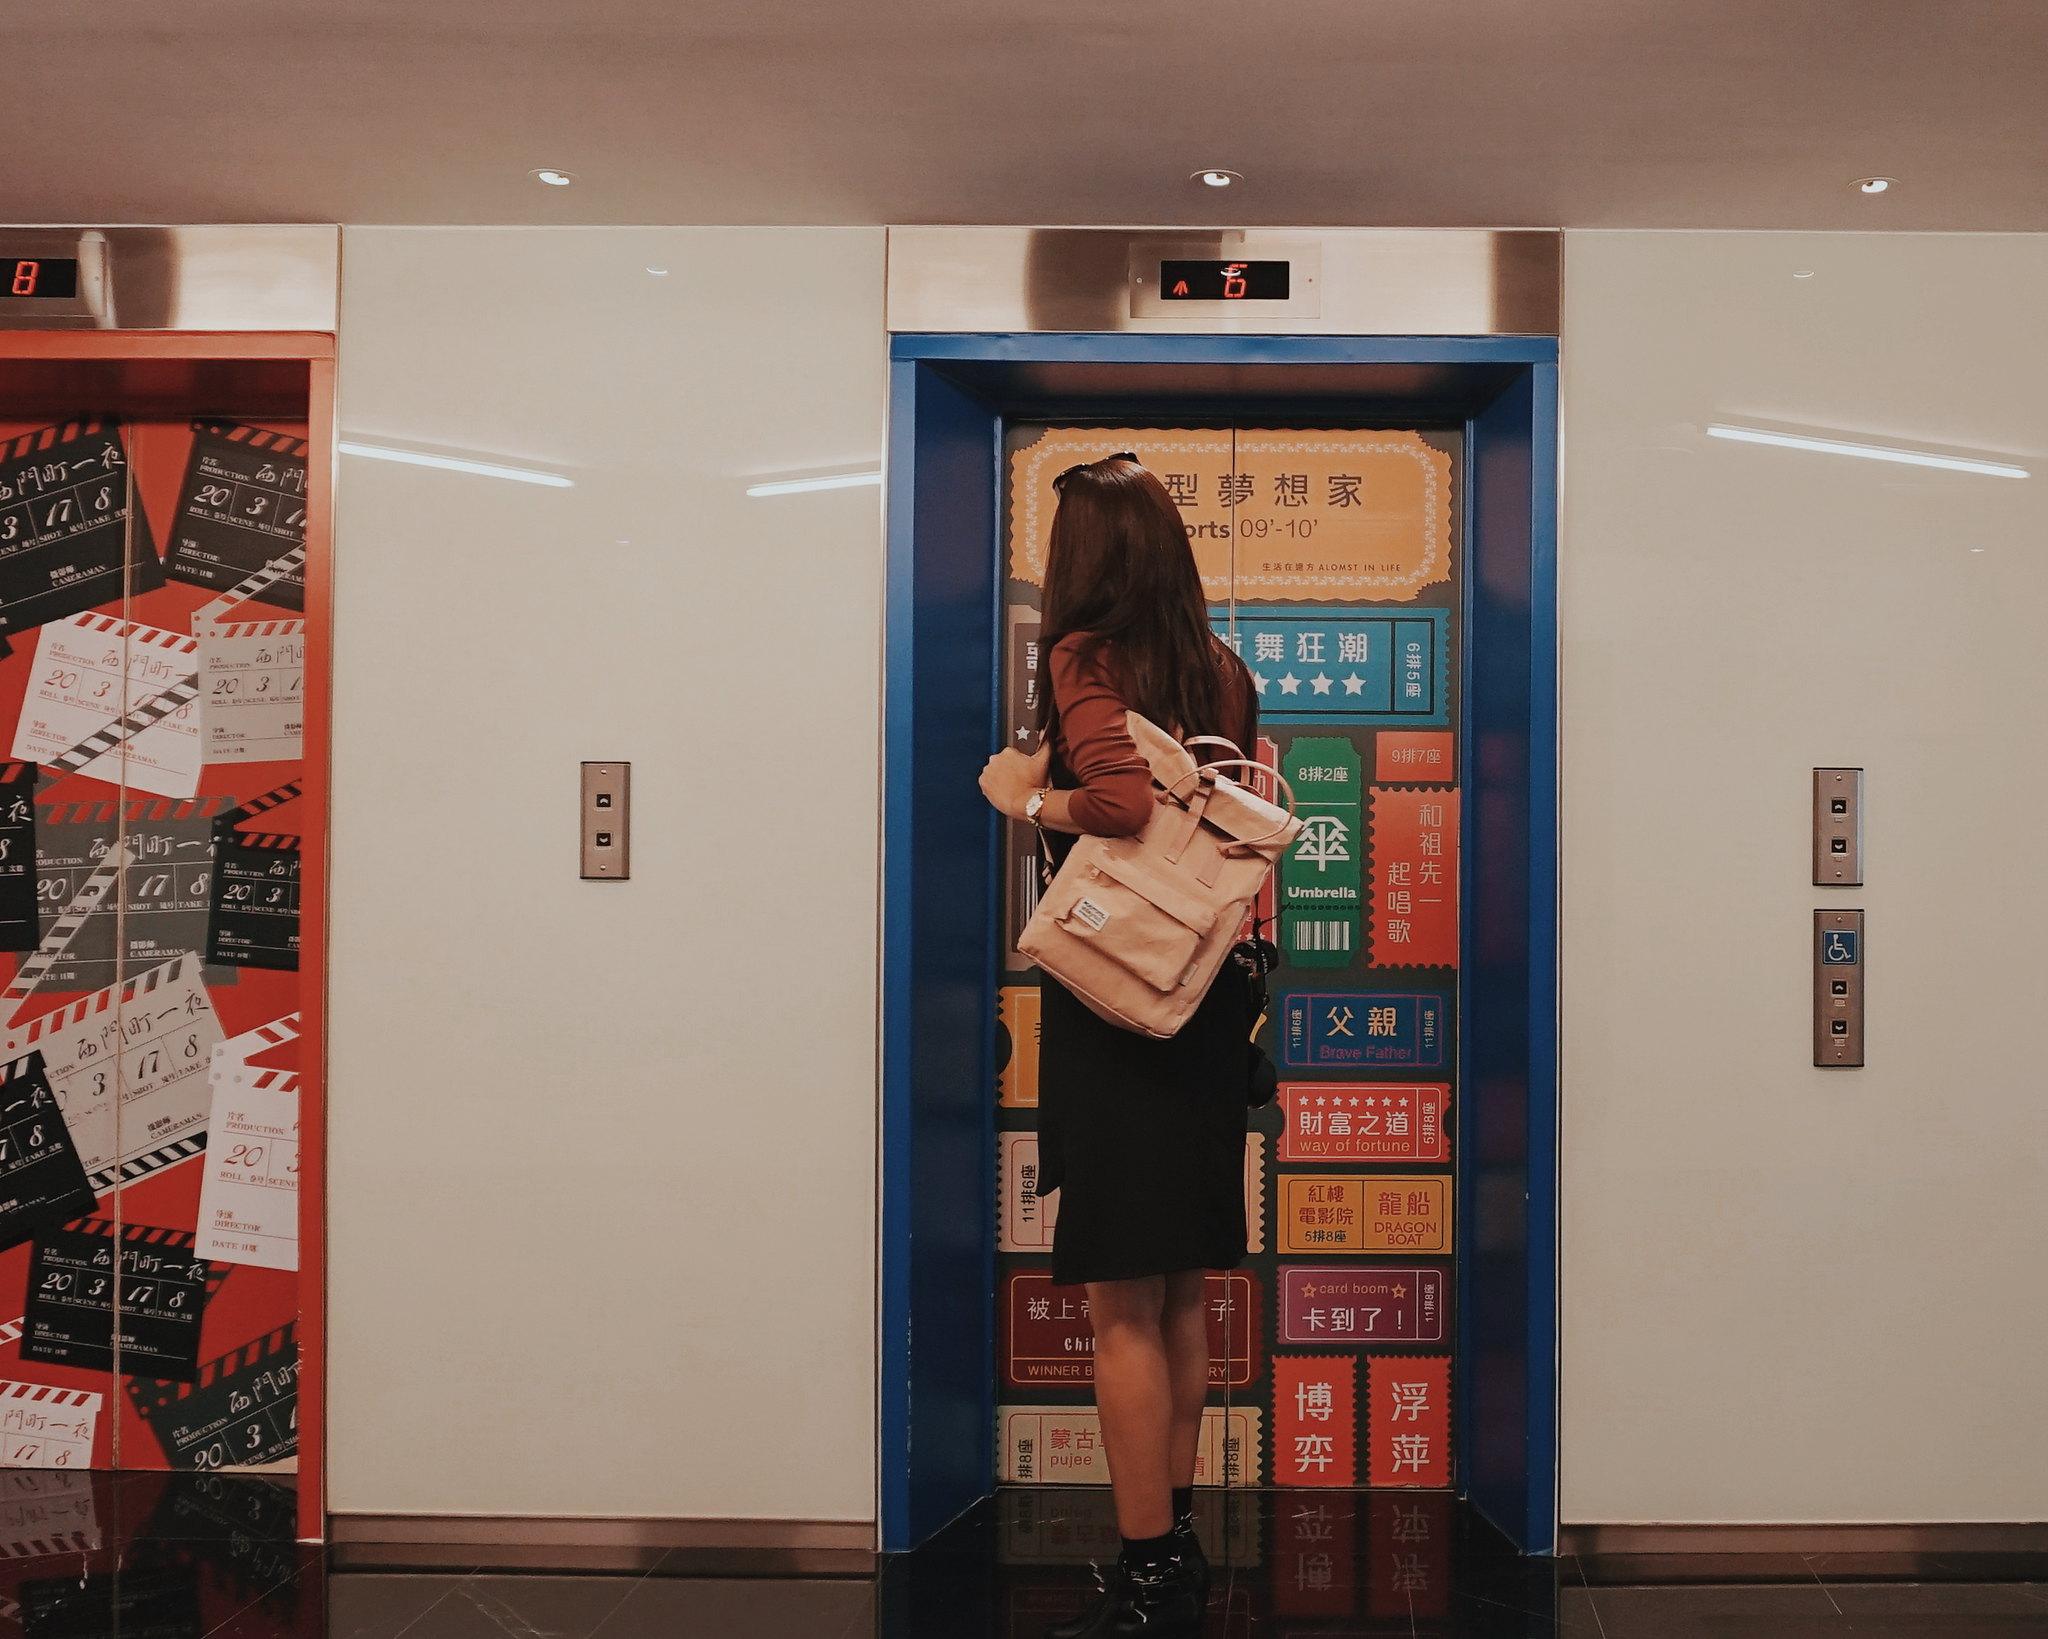 Amba Taipei Ximending Hotel Review